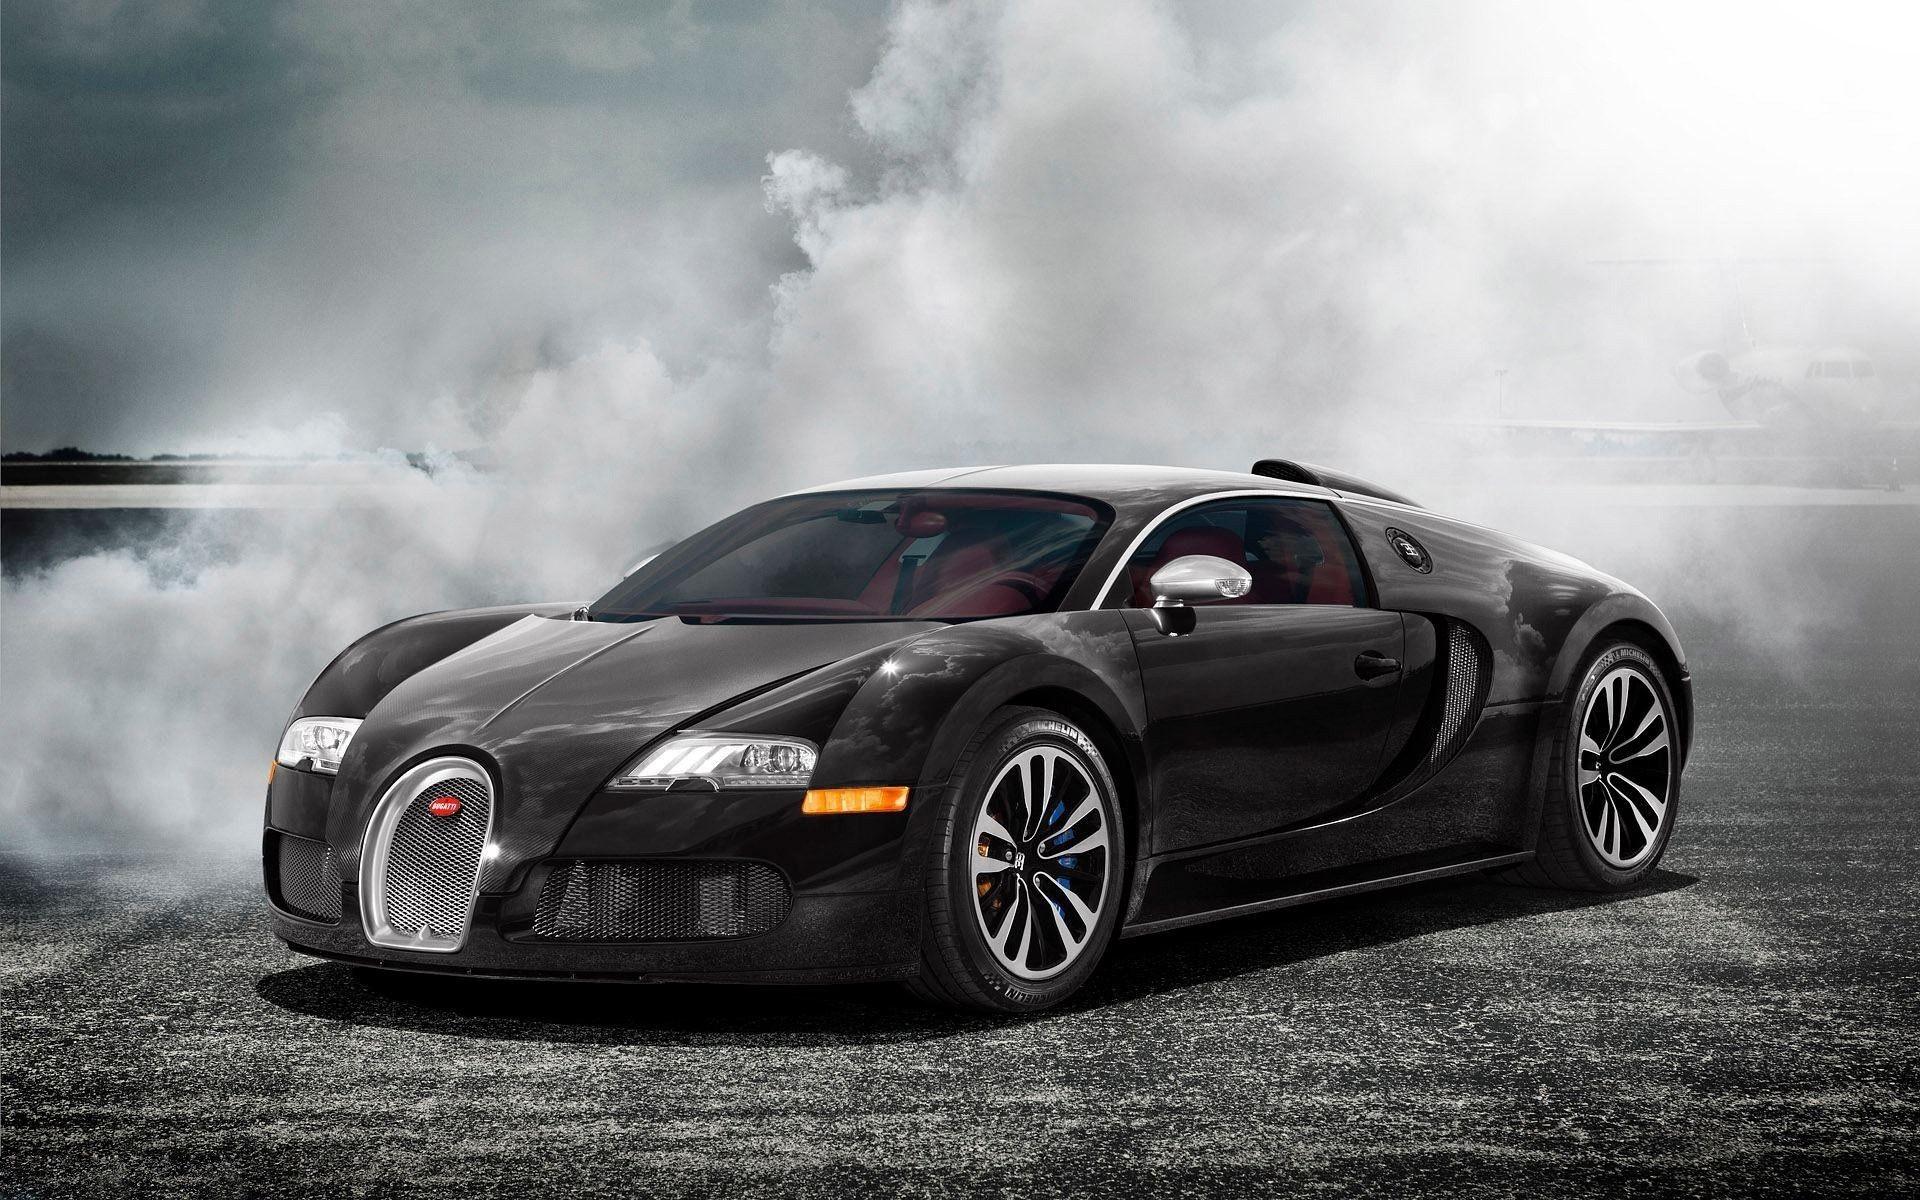 463999-bugatti-veyron-hd-wallpaper-1920x1200-4k Astounding Bugatti Veyron Grand Sport Vitesse Hd Cars Trend